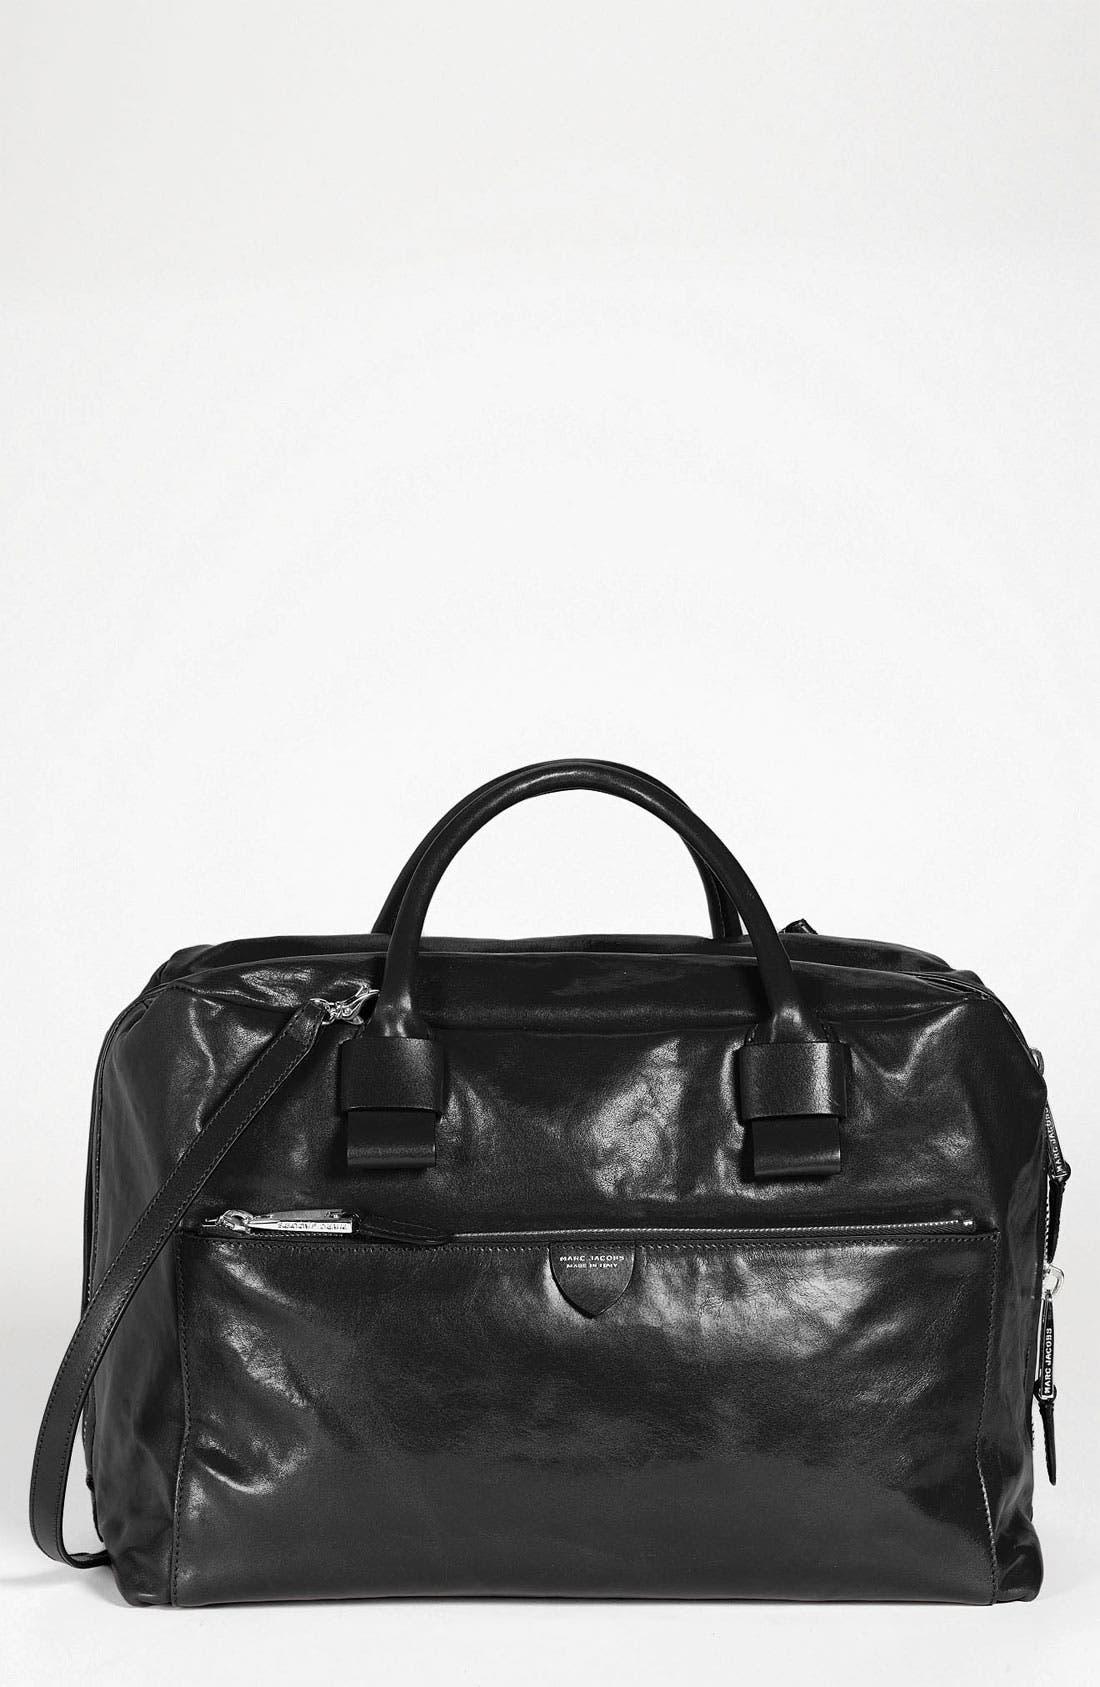 Alternate Image 1 Selected - MARC JACOBS 'Antonia'  Leather Satchel